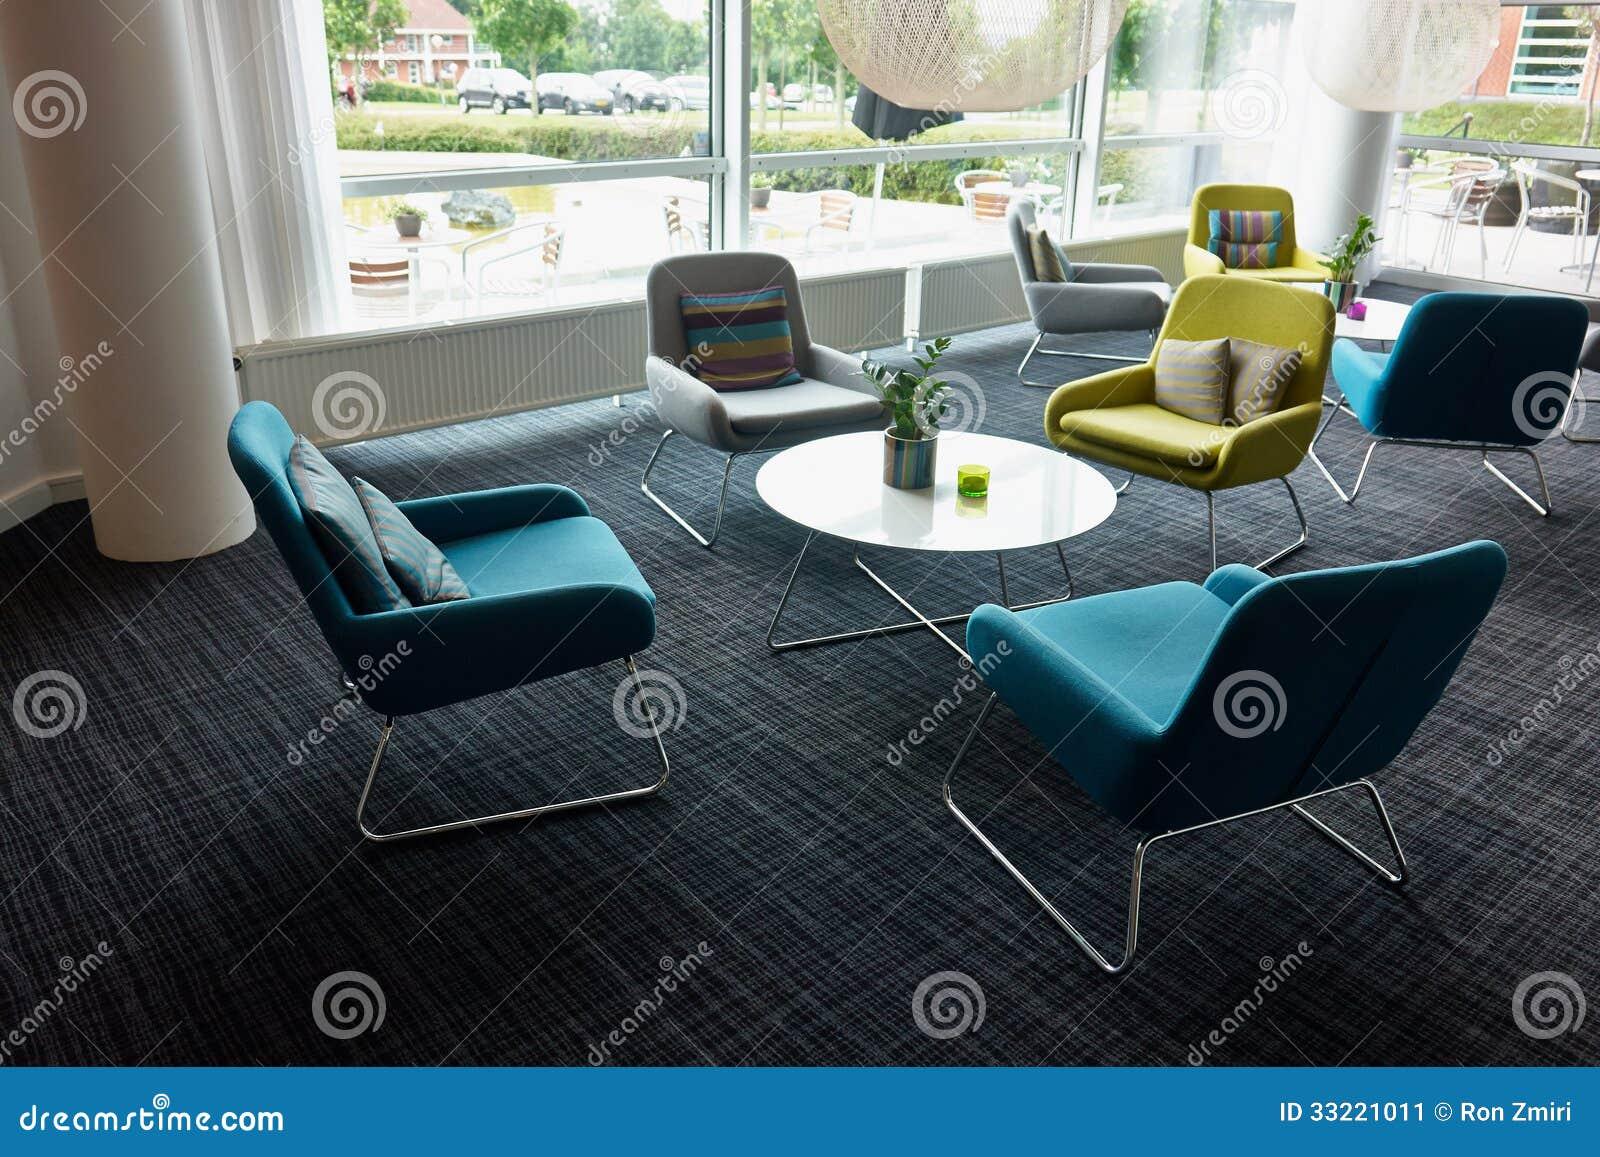 Recepci n moderna de la sala de espera imagen de archivo for Recepcion oficina moderna